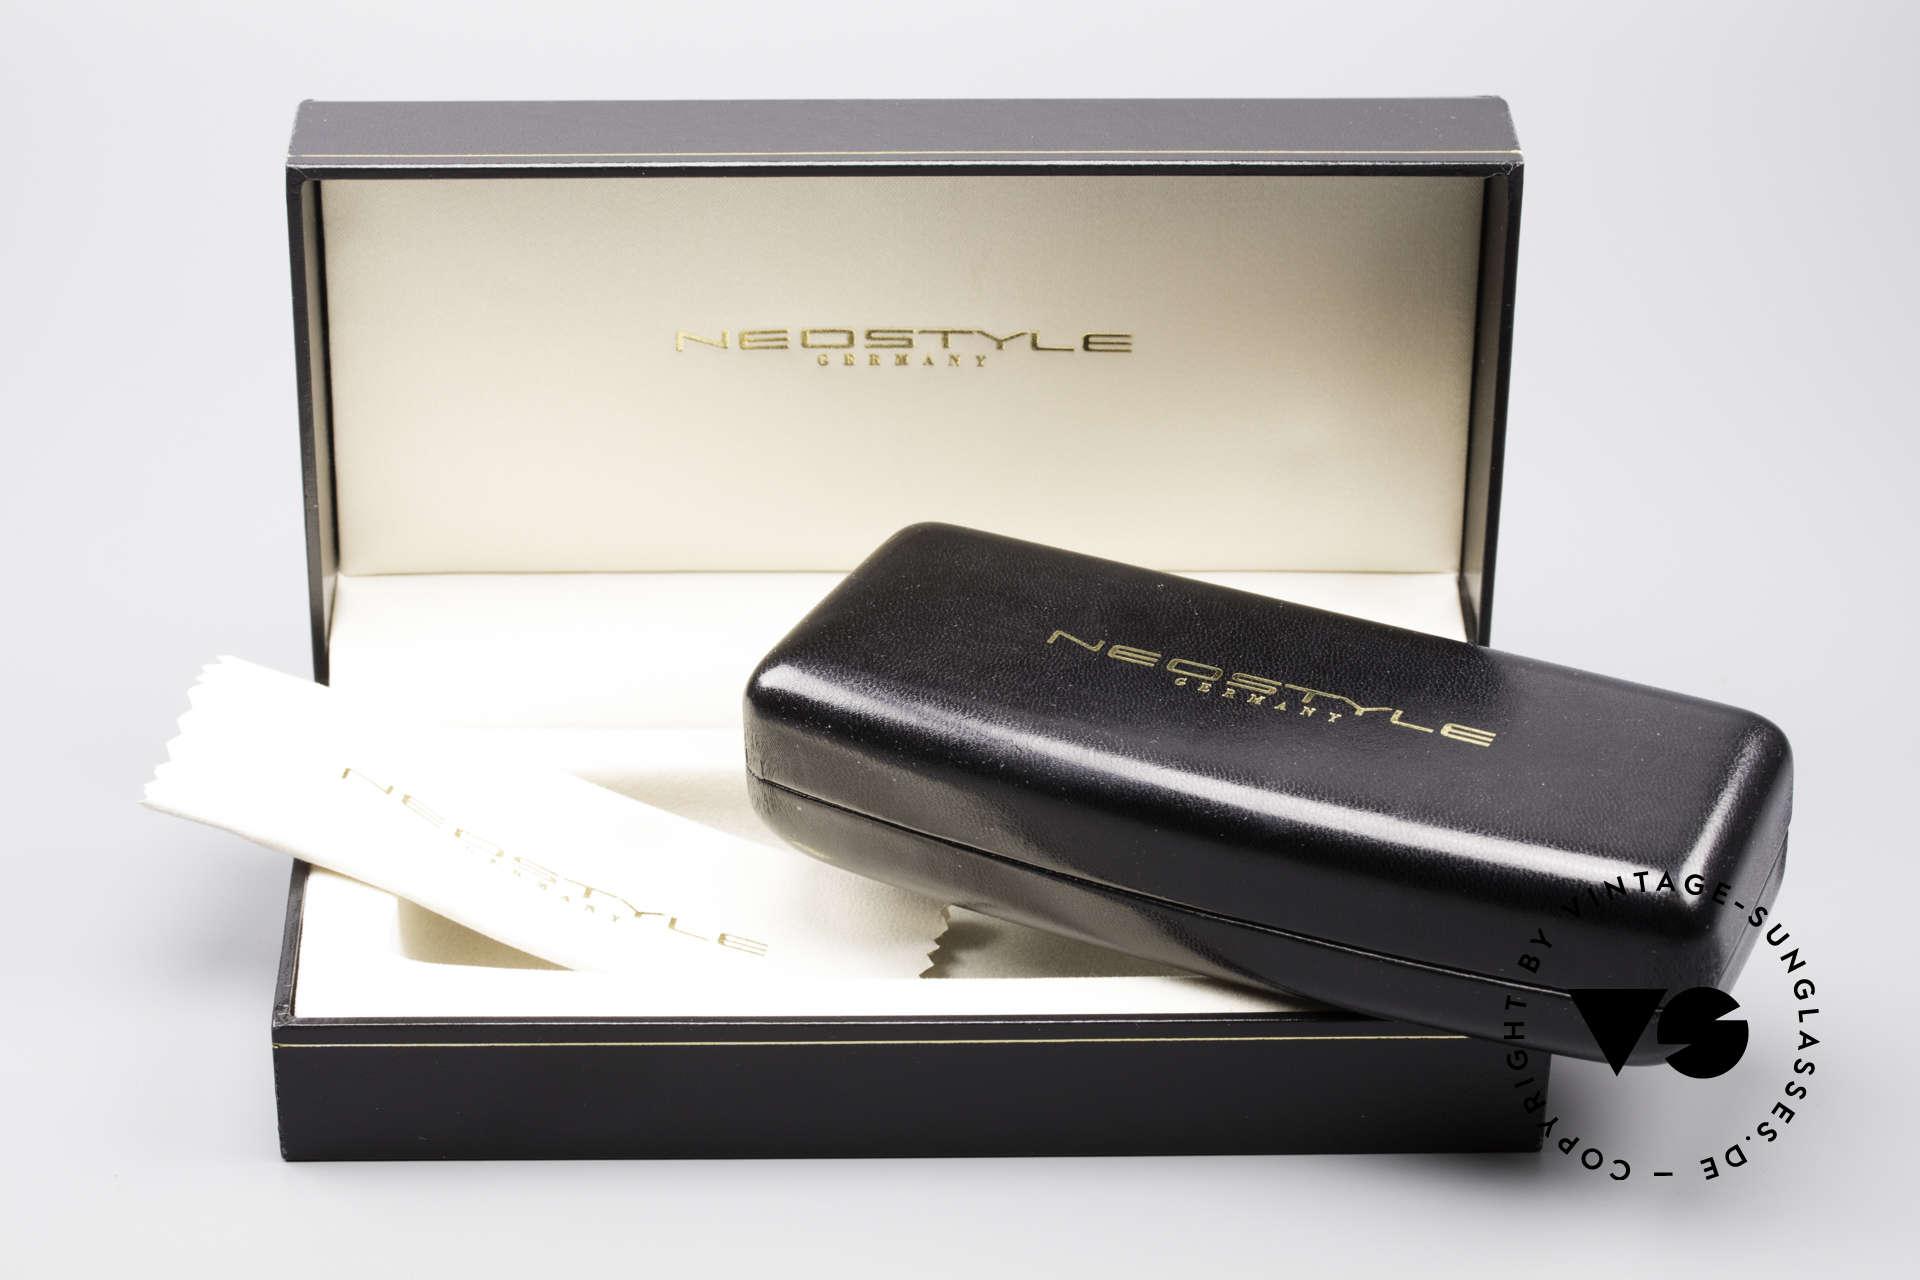 Neostyle Jet 230 80's Vintage No Retro Glasses, Size: medium, Made for Men